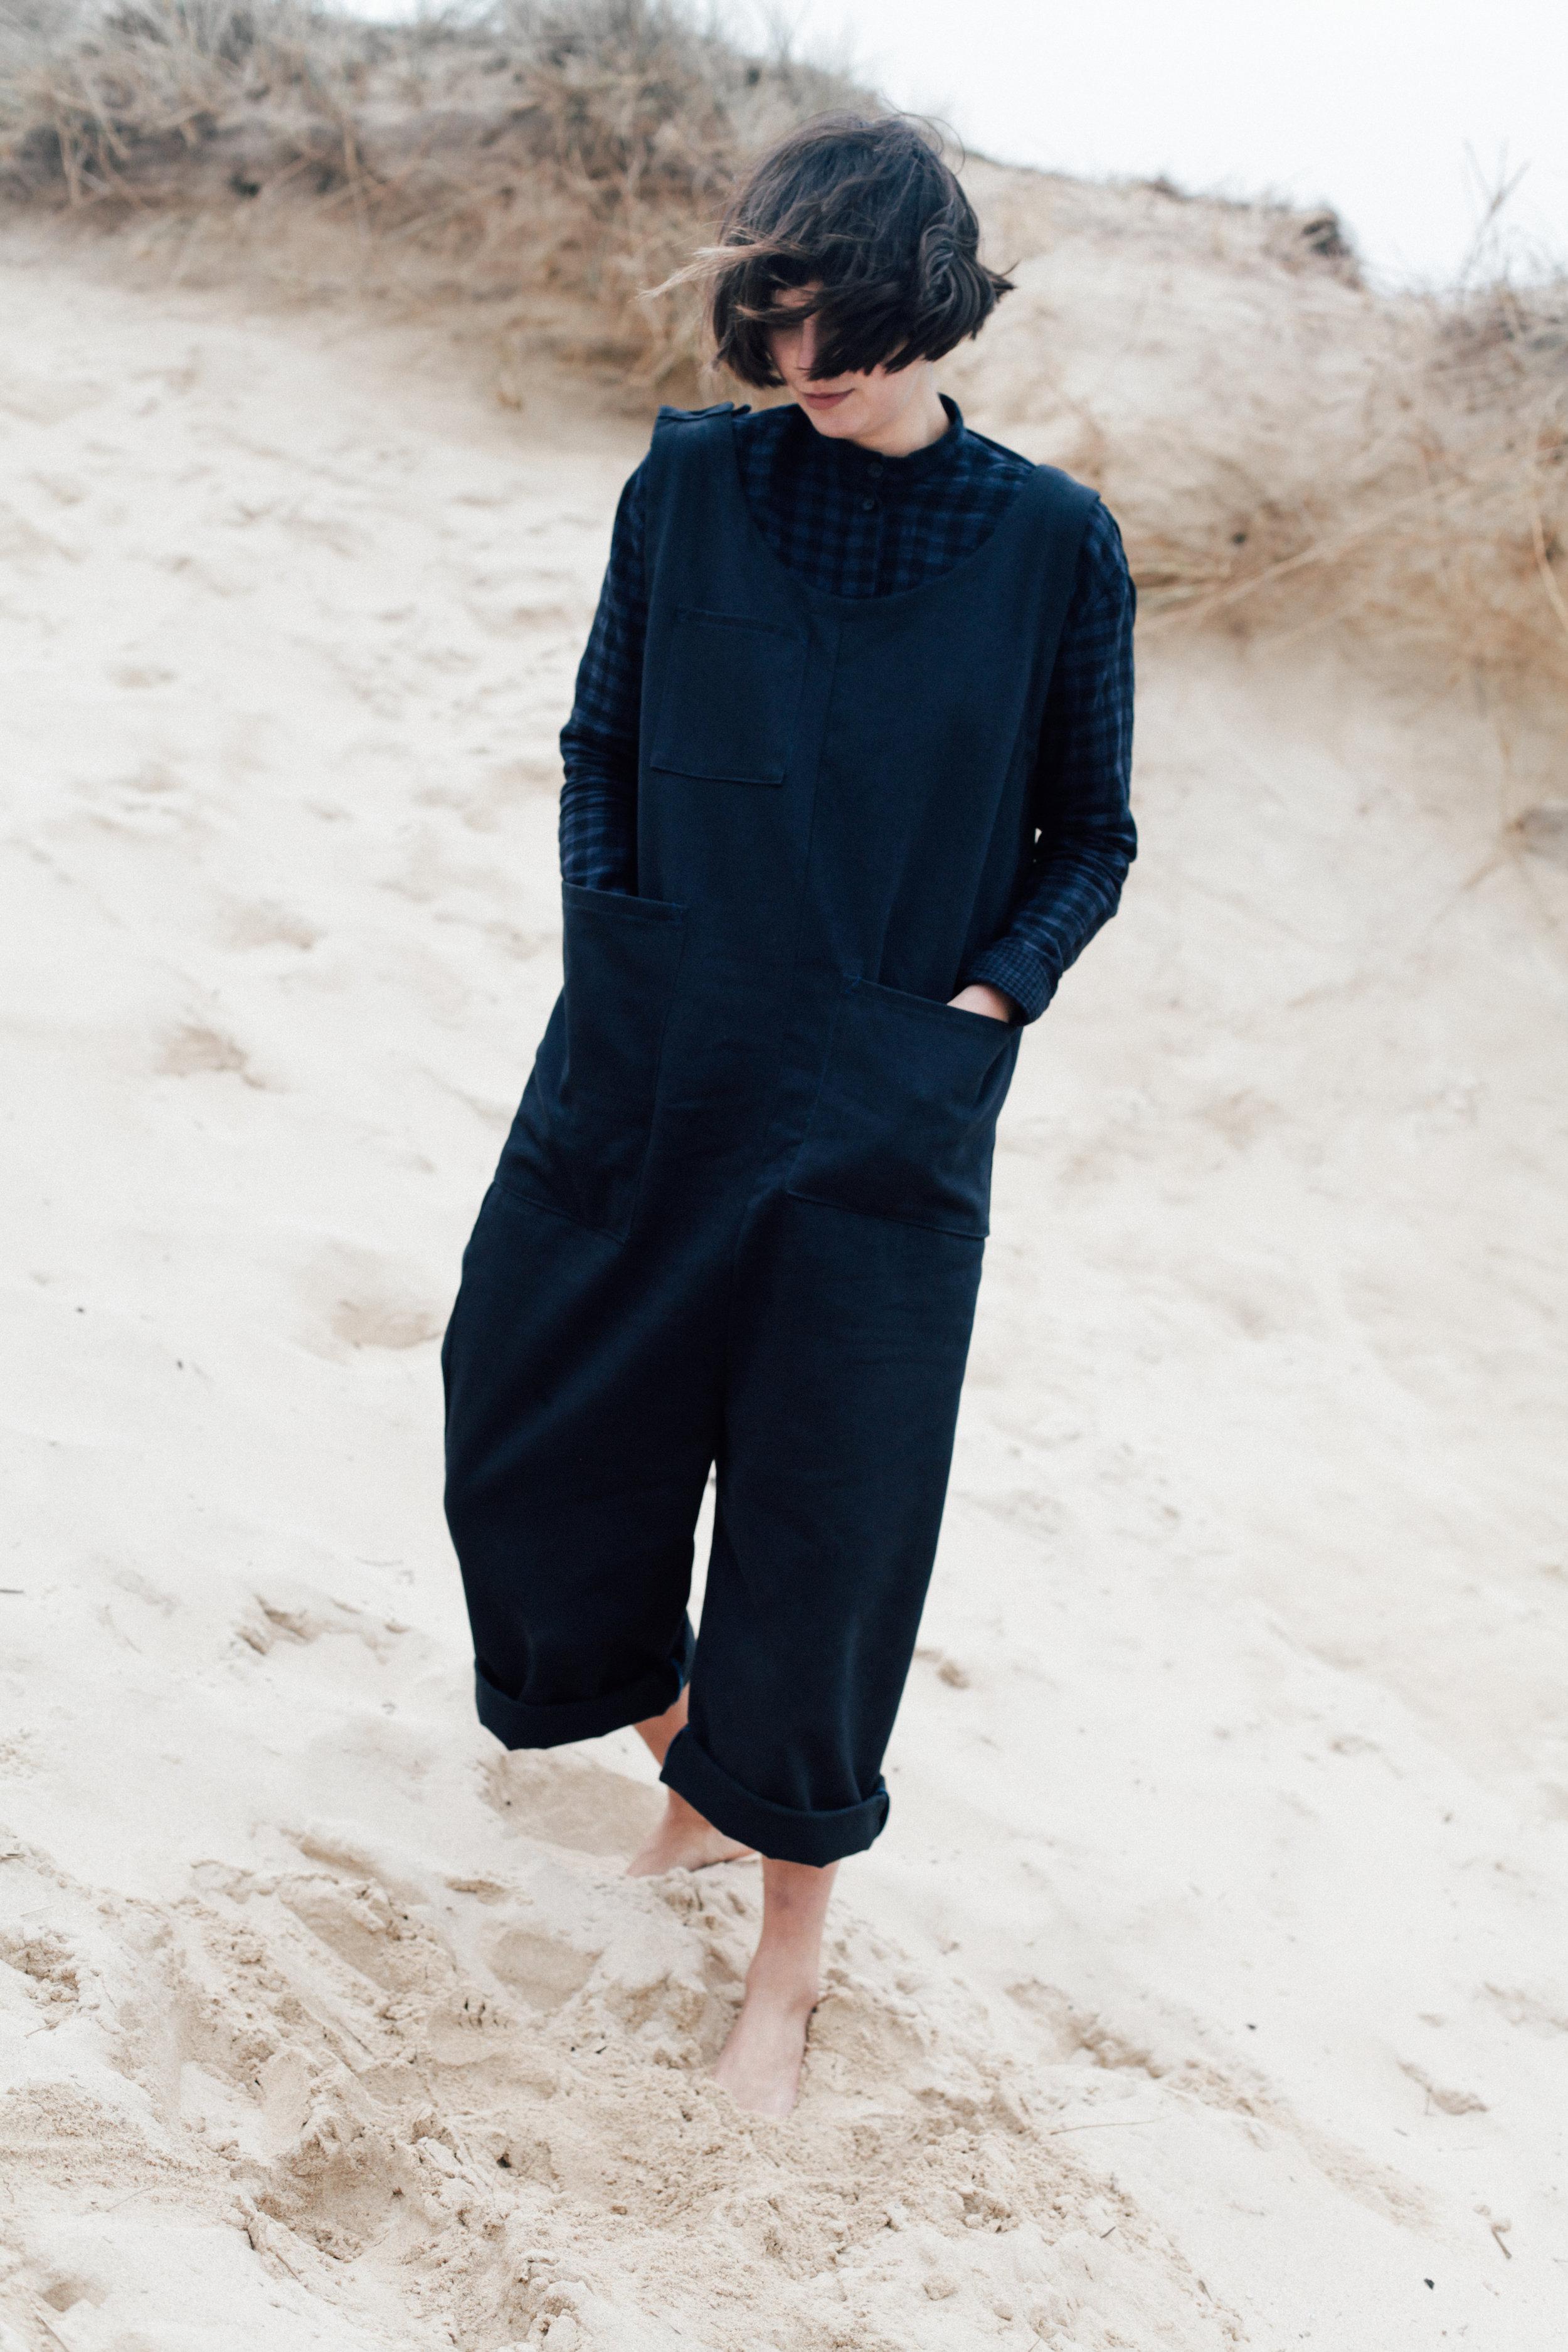 sarah johnson cabbage blue indigo clothing cast cornwall folklore